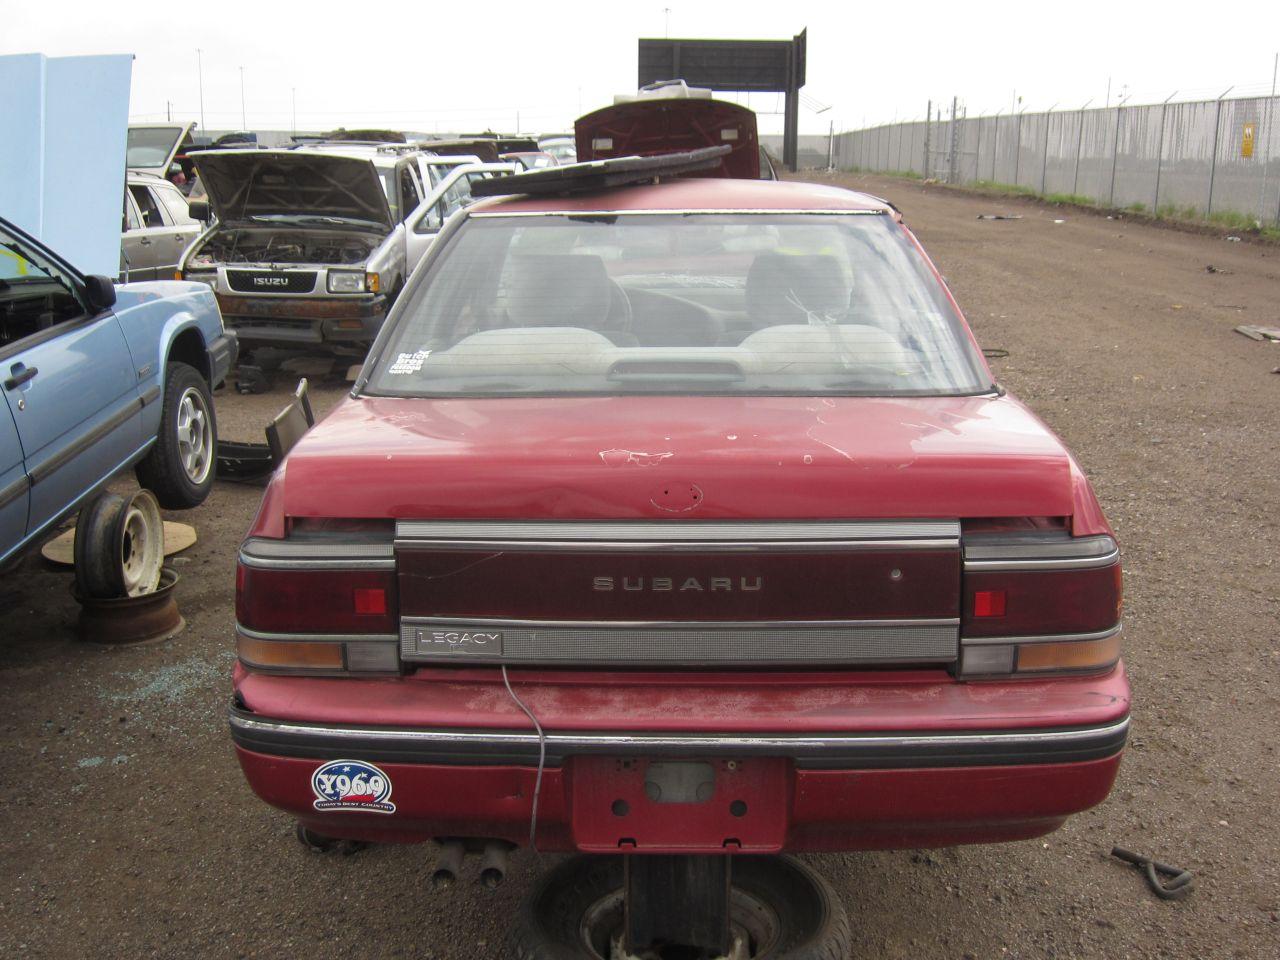 Subaru Legacy I 1989 - 1994 Sedan #5